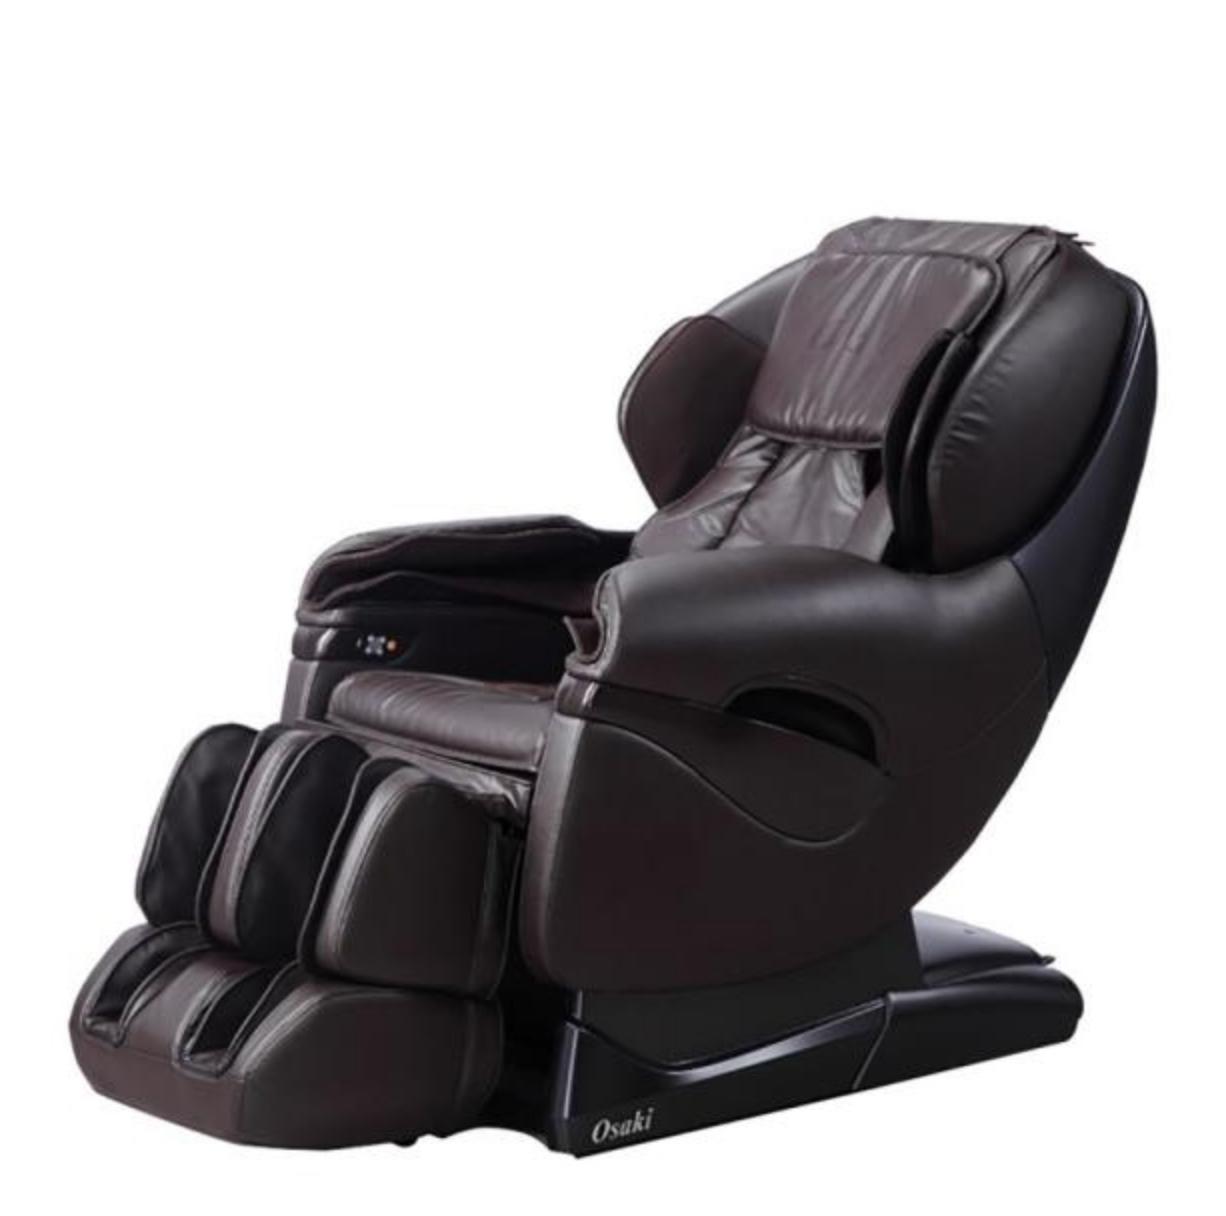 **Starts 11/8 Titan OSAKI TP-8500 Massage Chair (Brown) $1395 at Home Depot